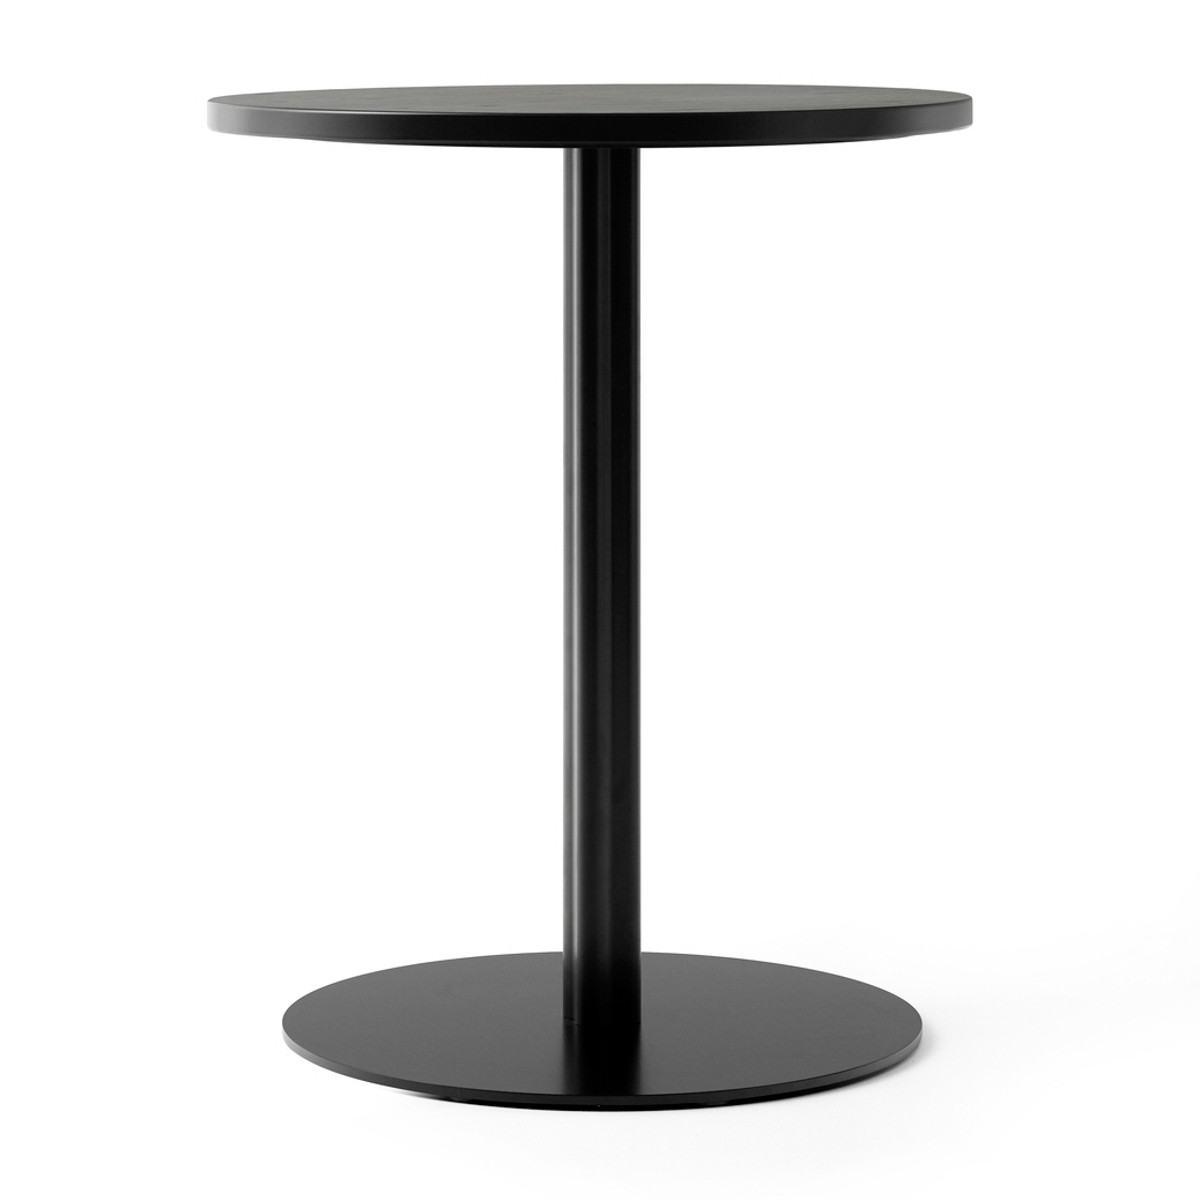 Menu Colomn Dining Table - Ø60cm